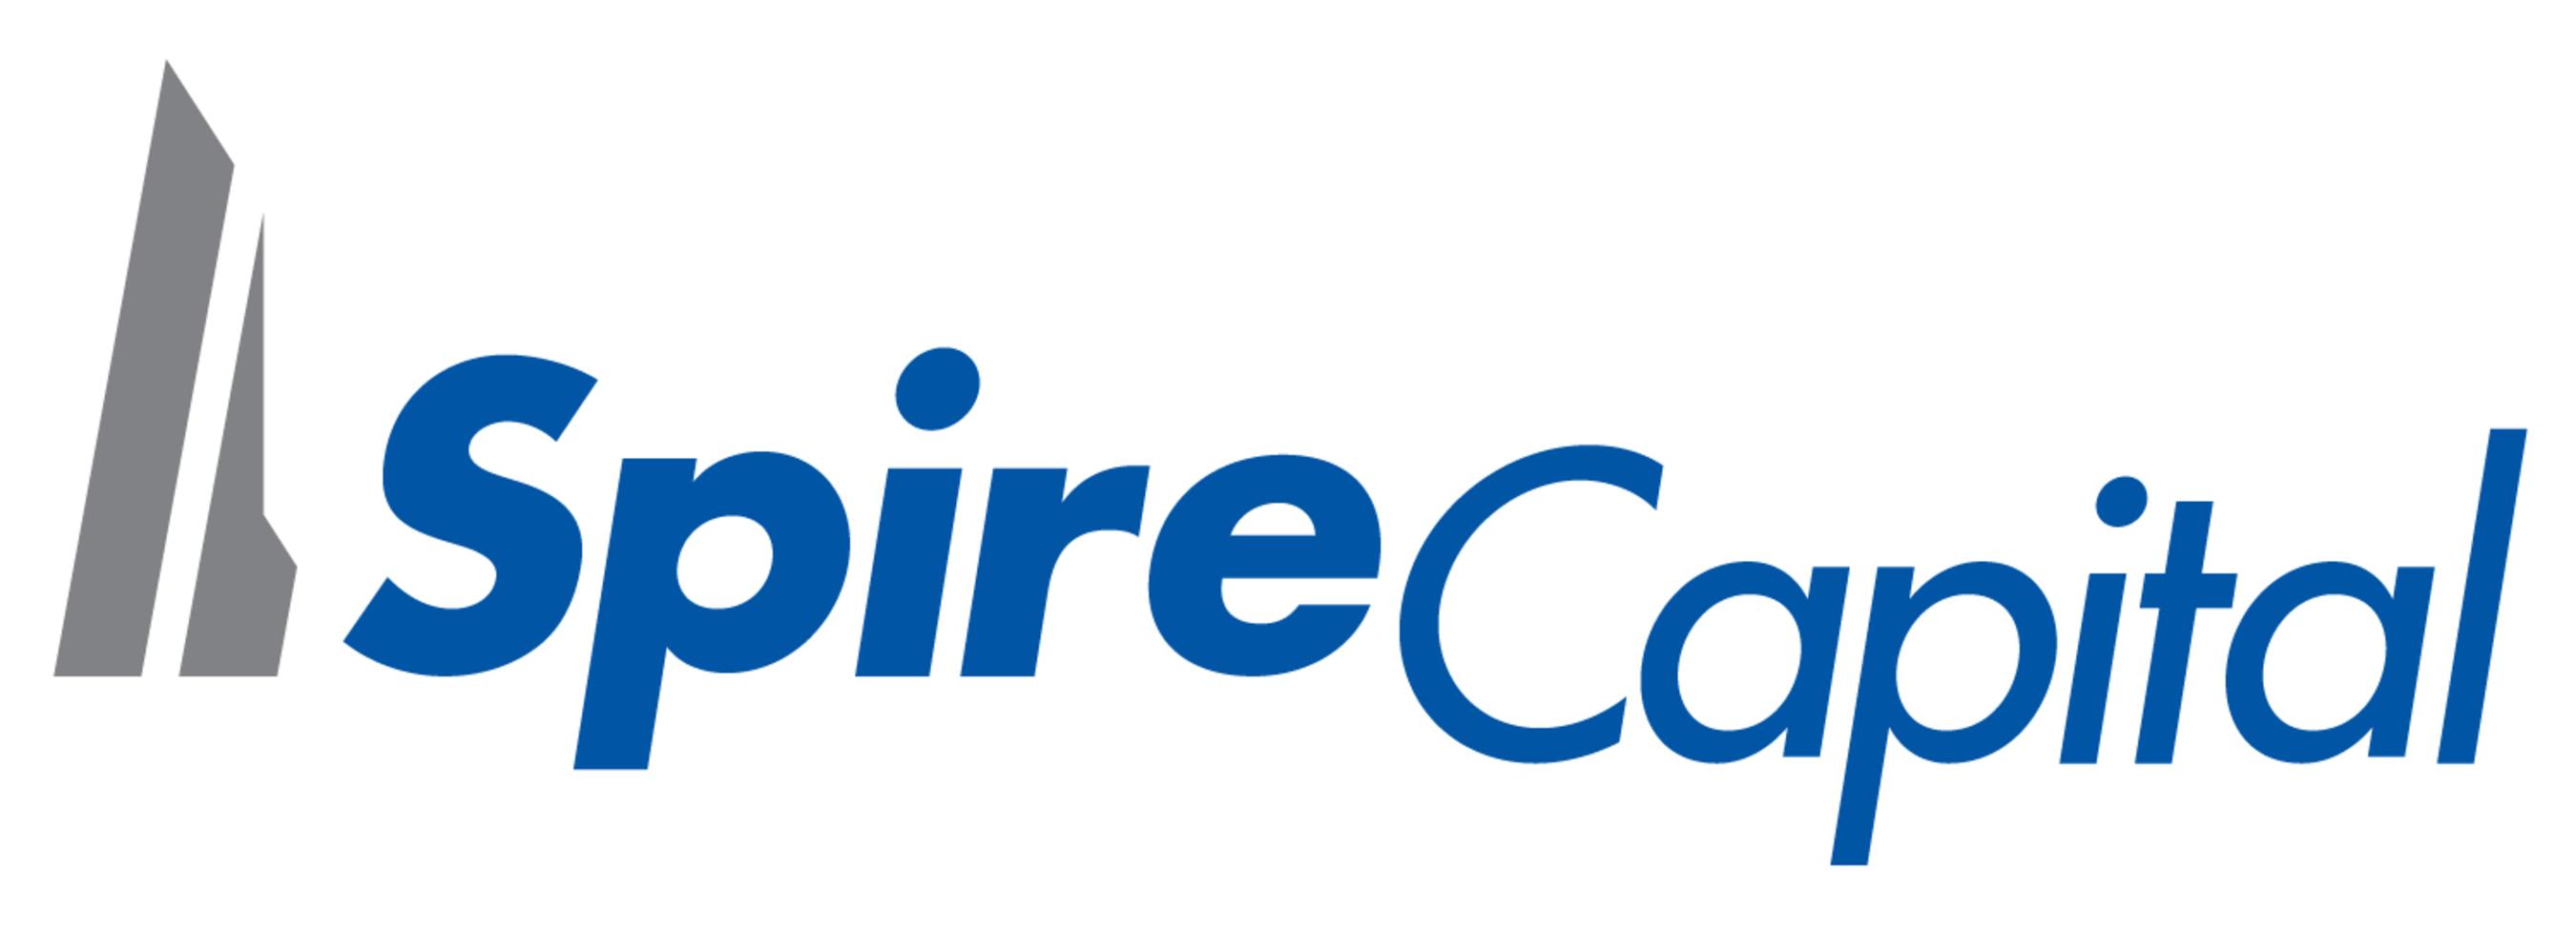 Spire Capital logo